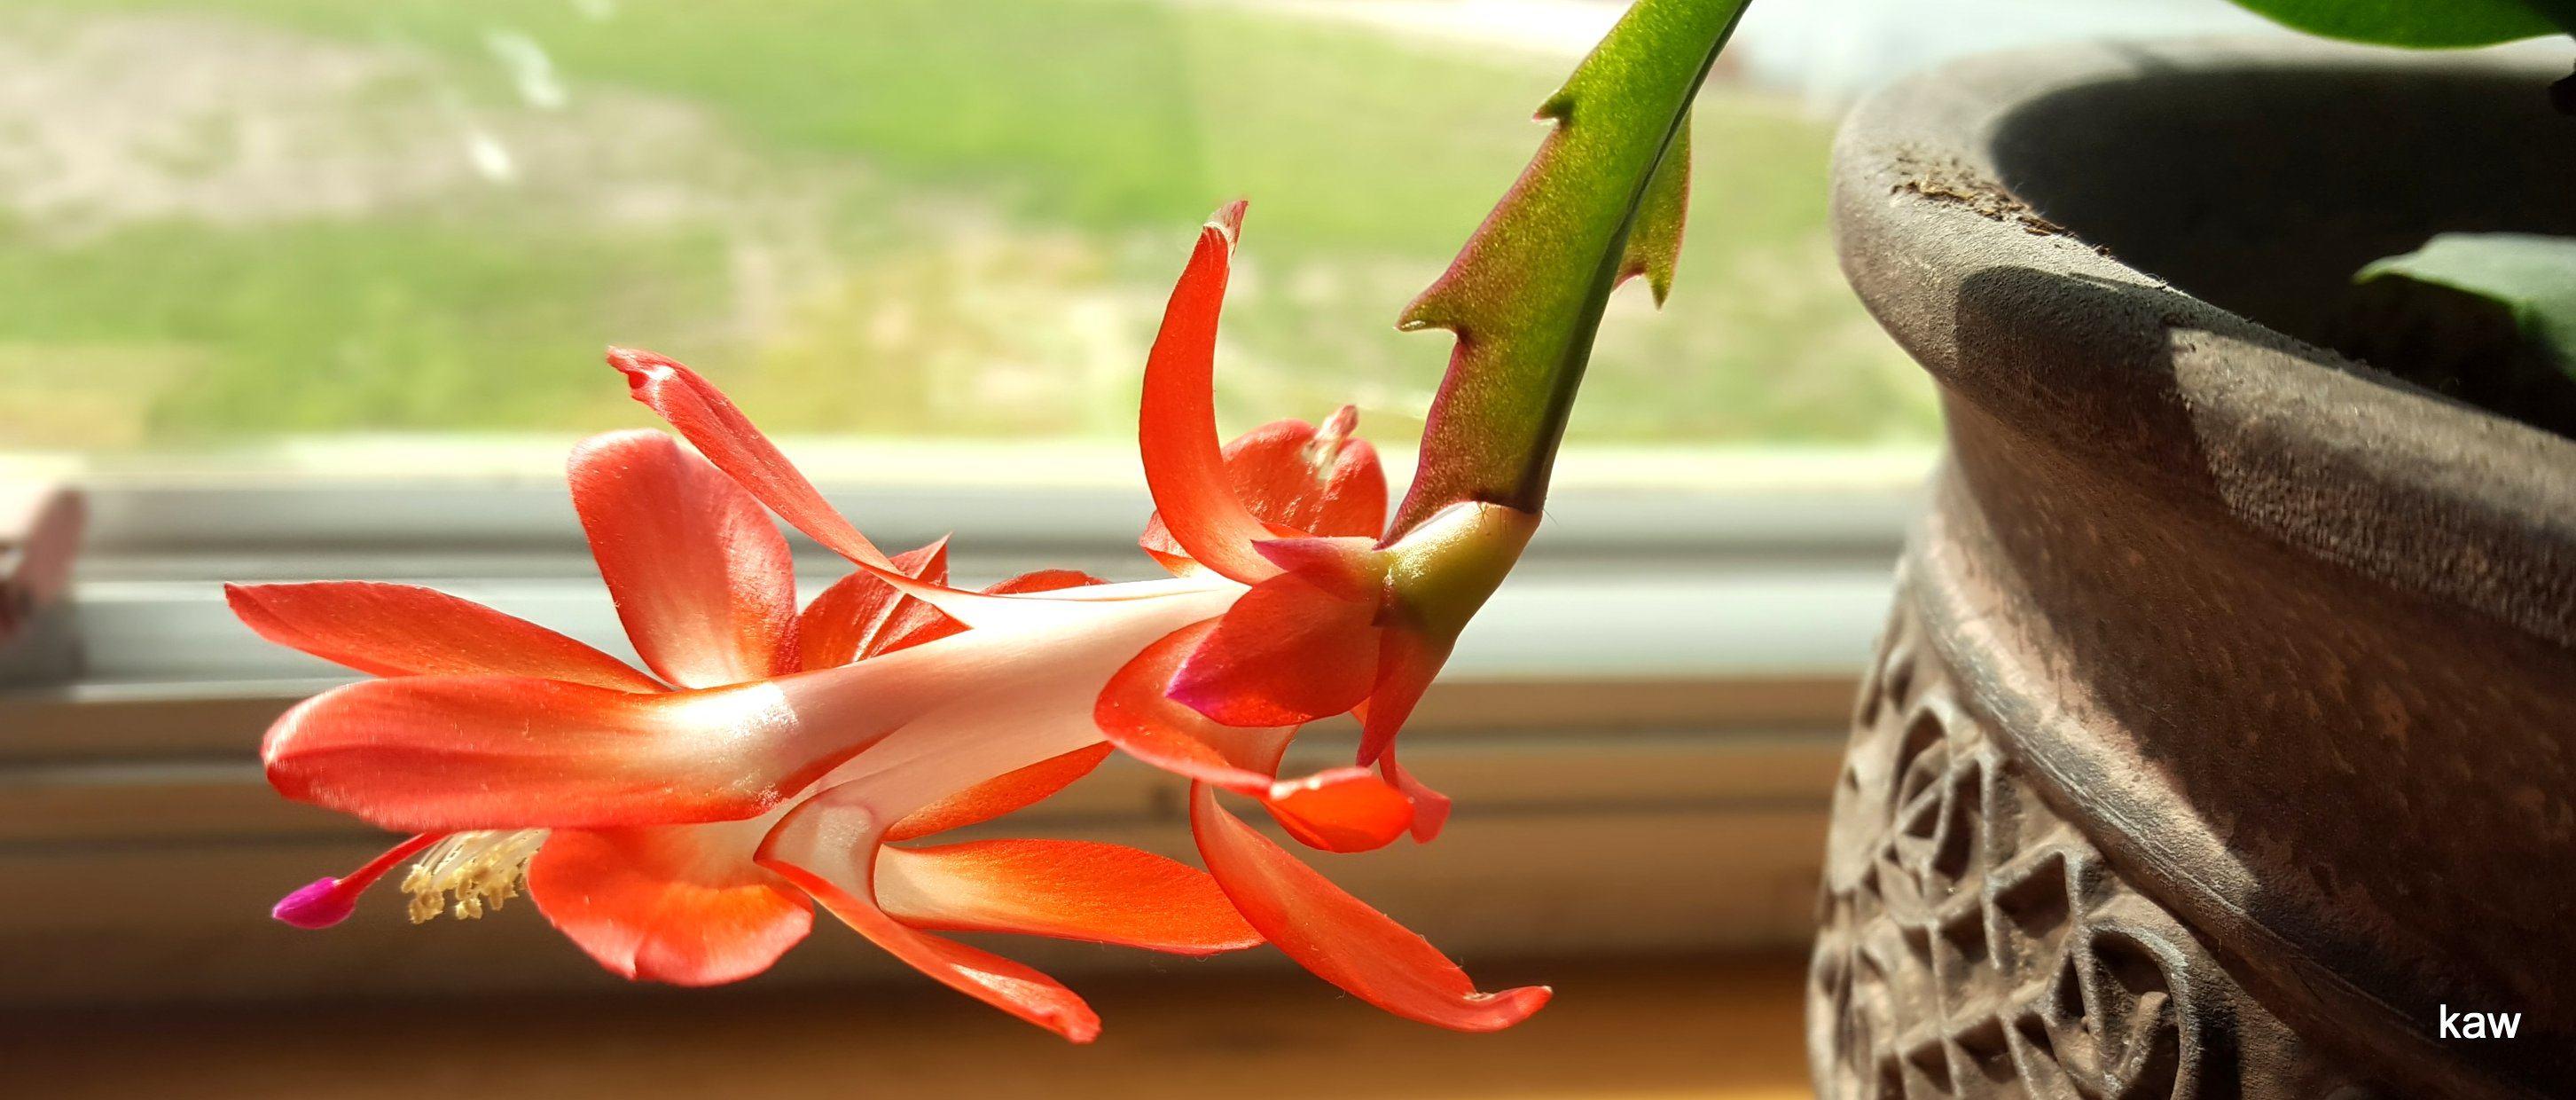 Photo of Christmas cactus